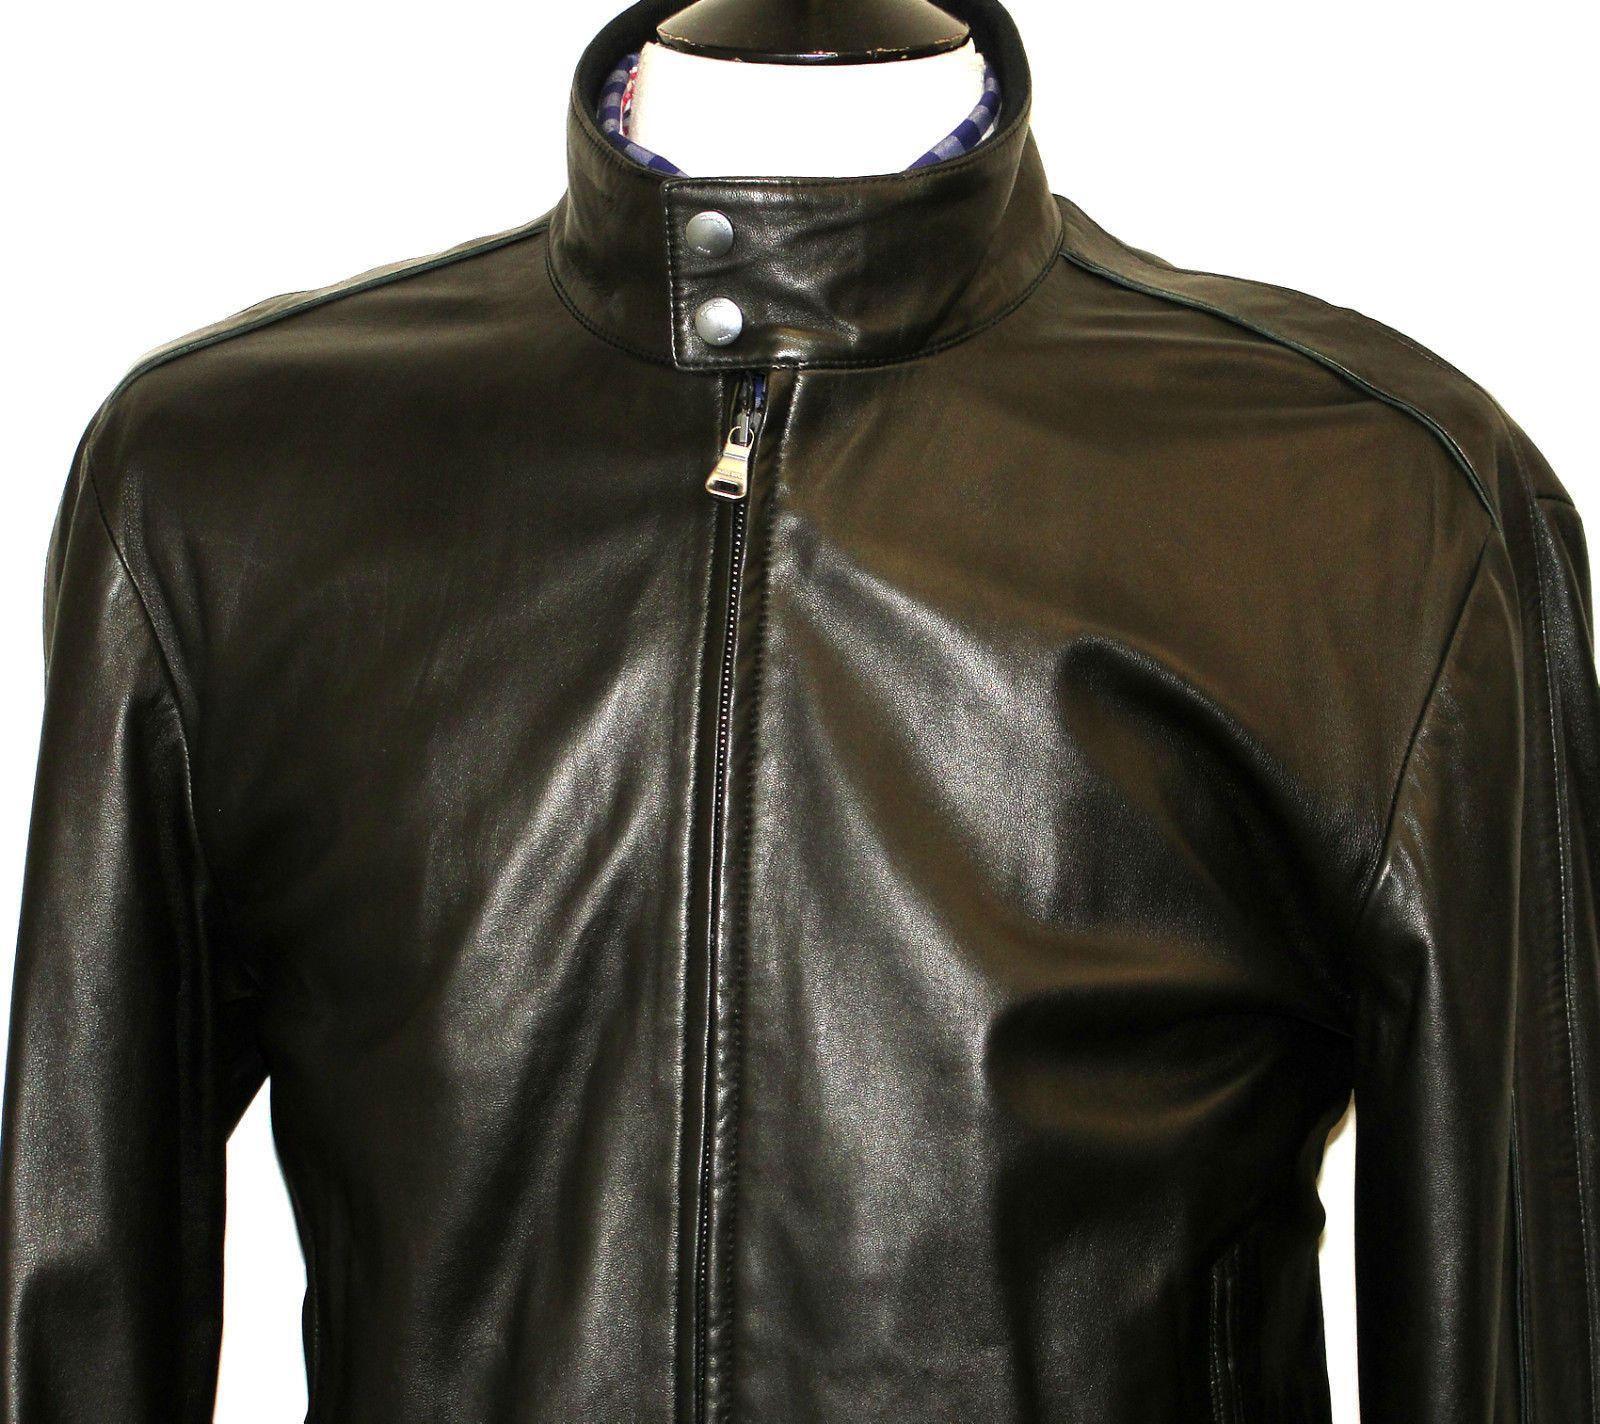 Hugo Boss Jacket (Men's Preowned Soft Black Leather Biker